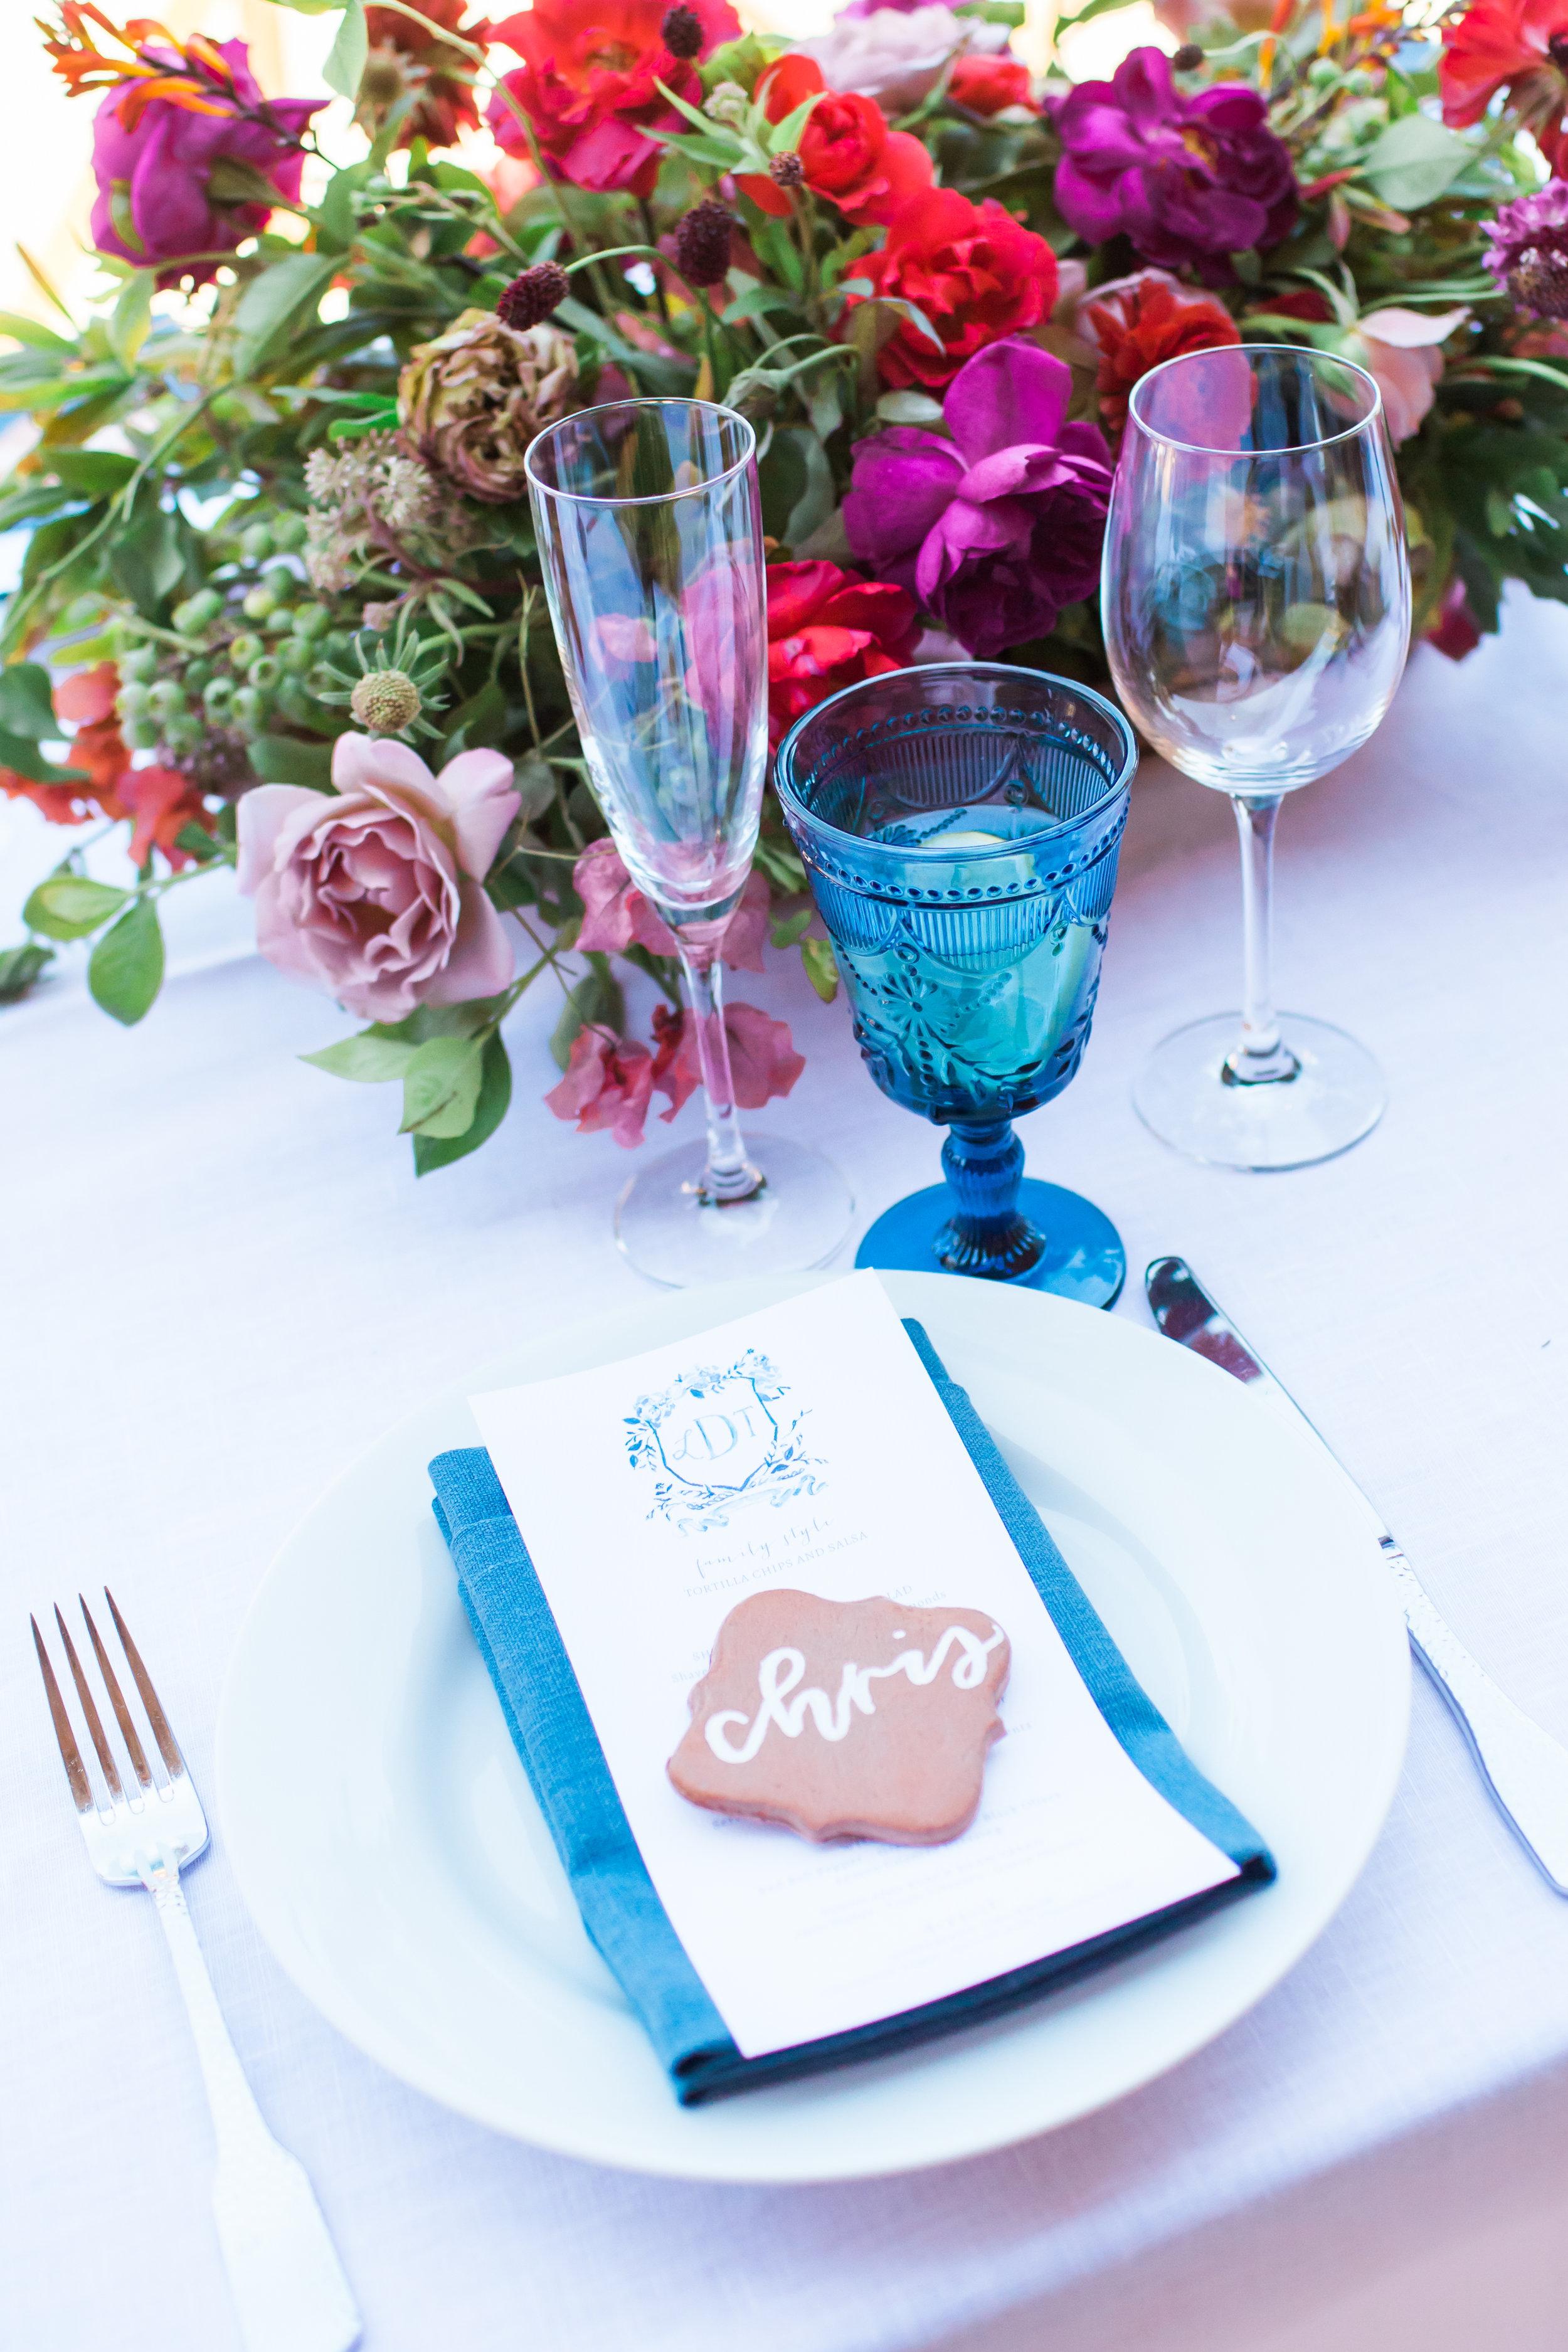 www.santabarbarawedding.com | James and Jess Photography | Santa Barbara Historical | Amazing Day Events | La Fleur du Jour | La Tavola | Classic Party Rentals | Table Settings